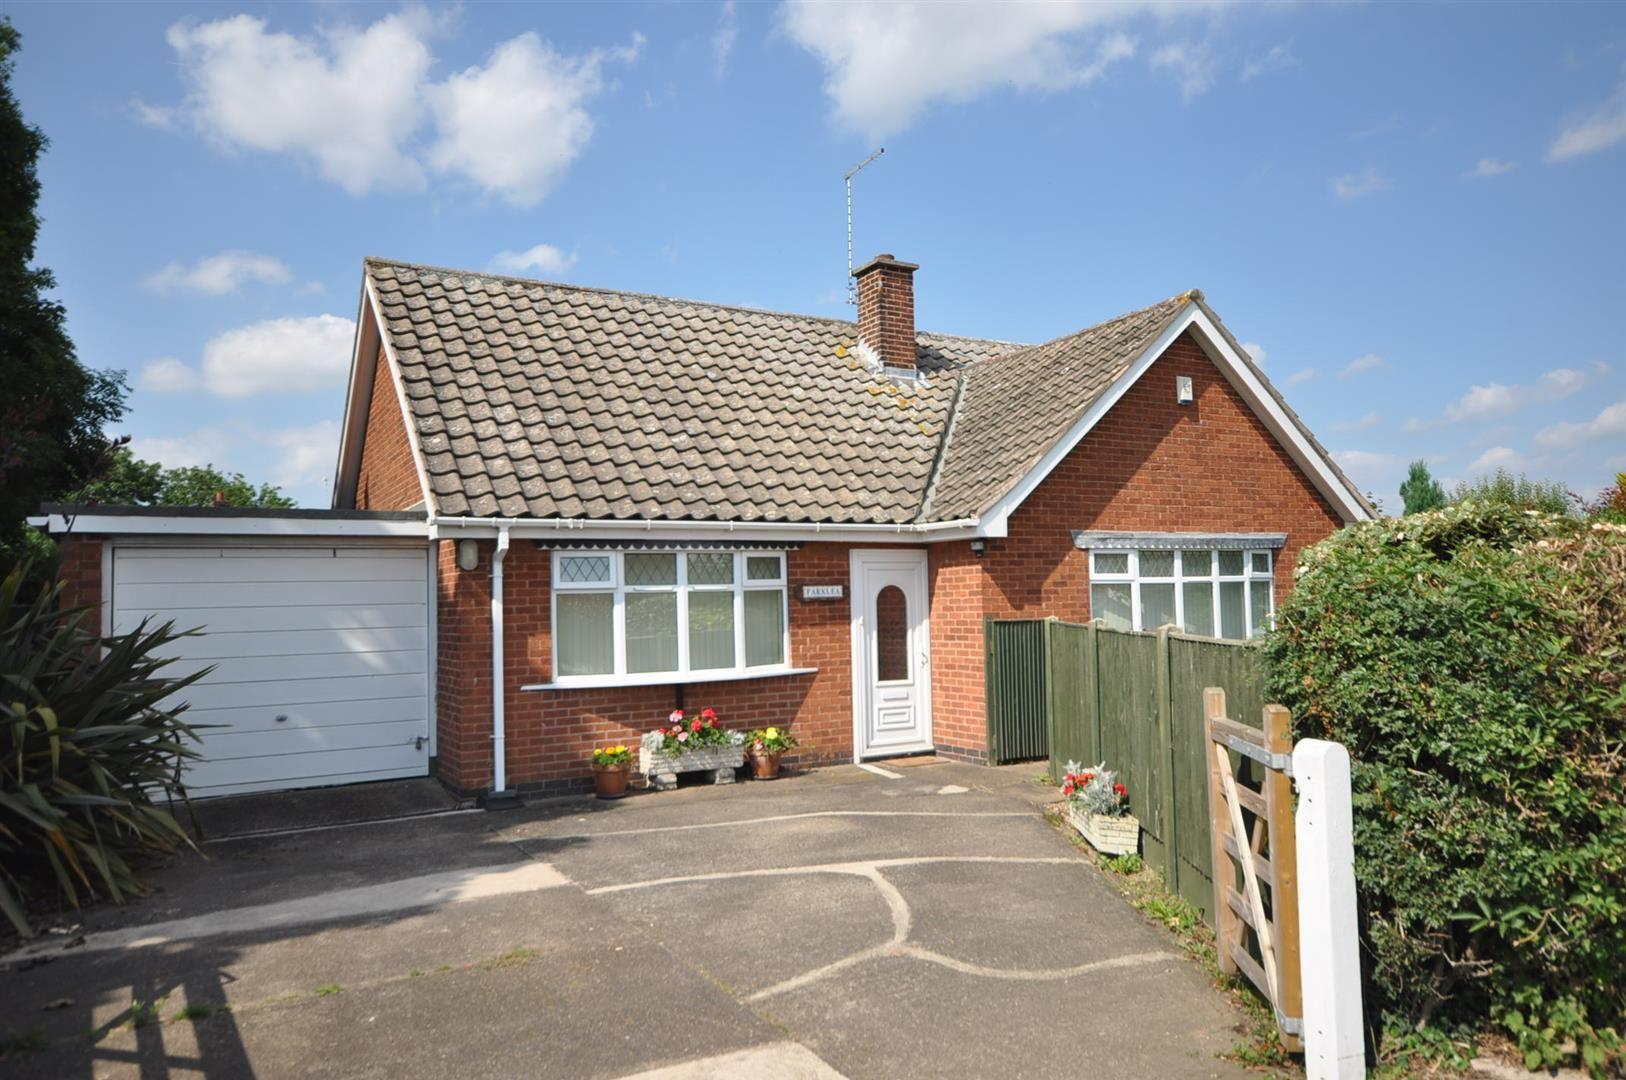 Property photo 1 of 15. Main.Jpg